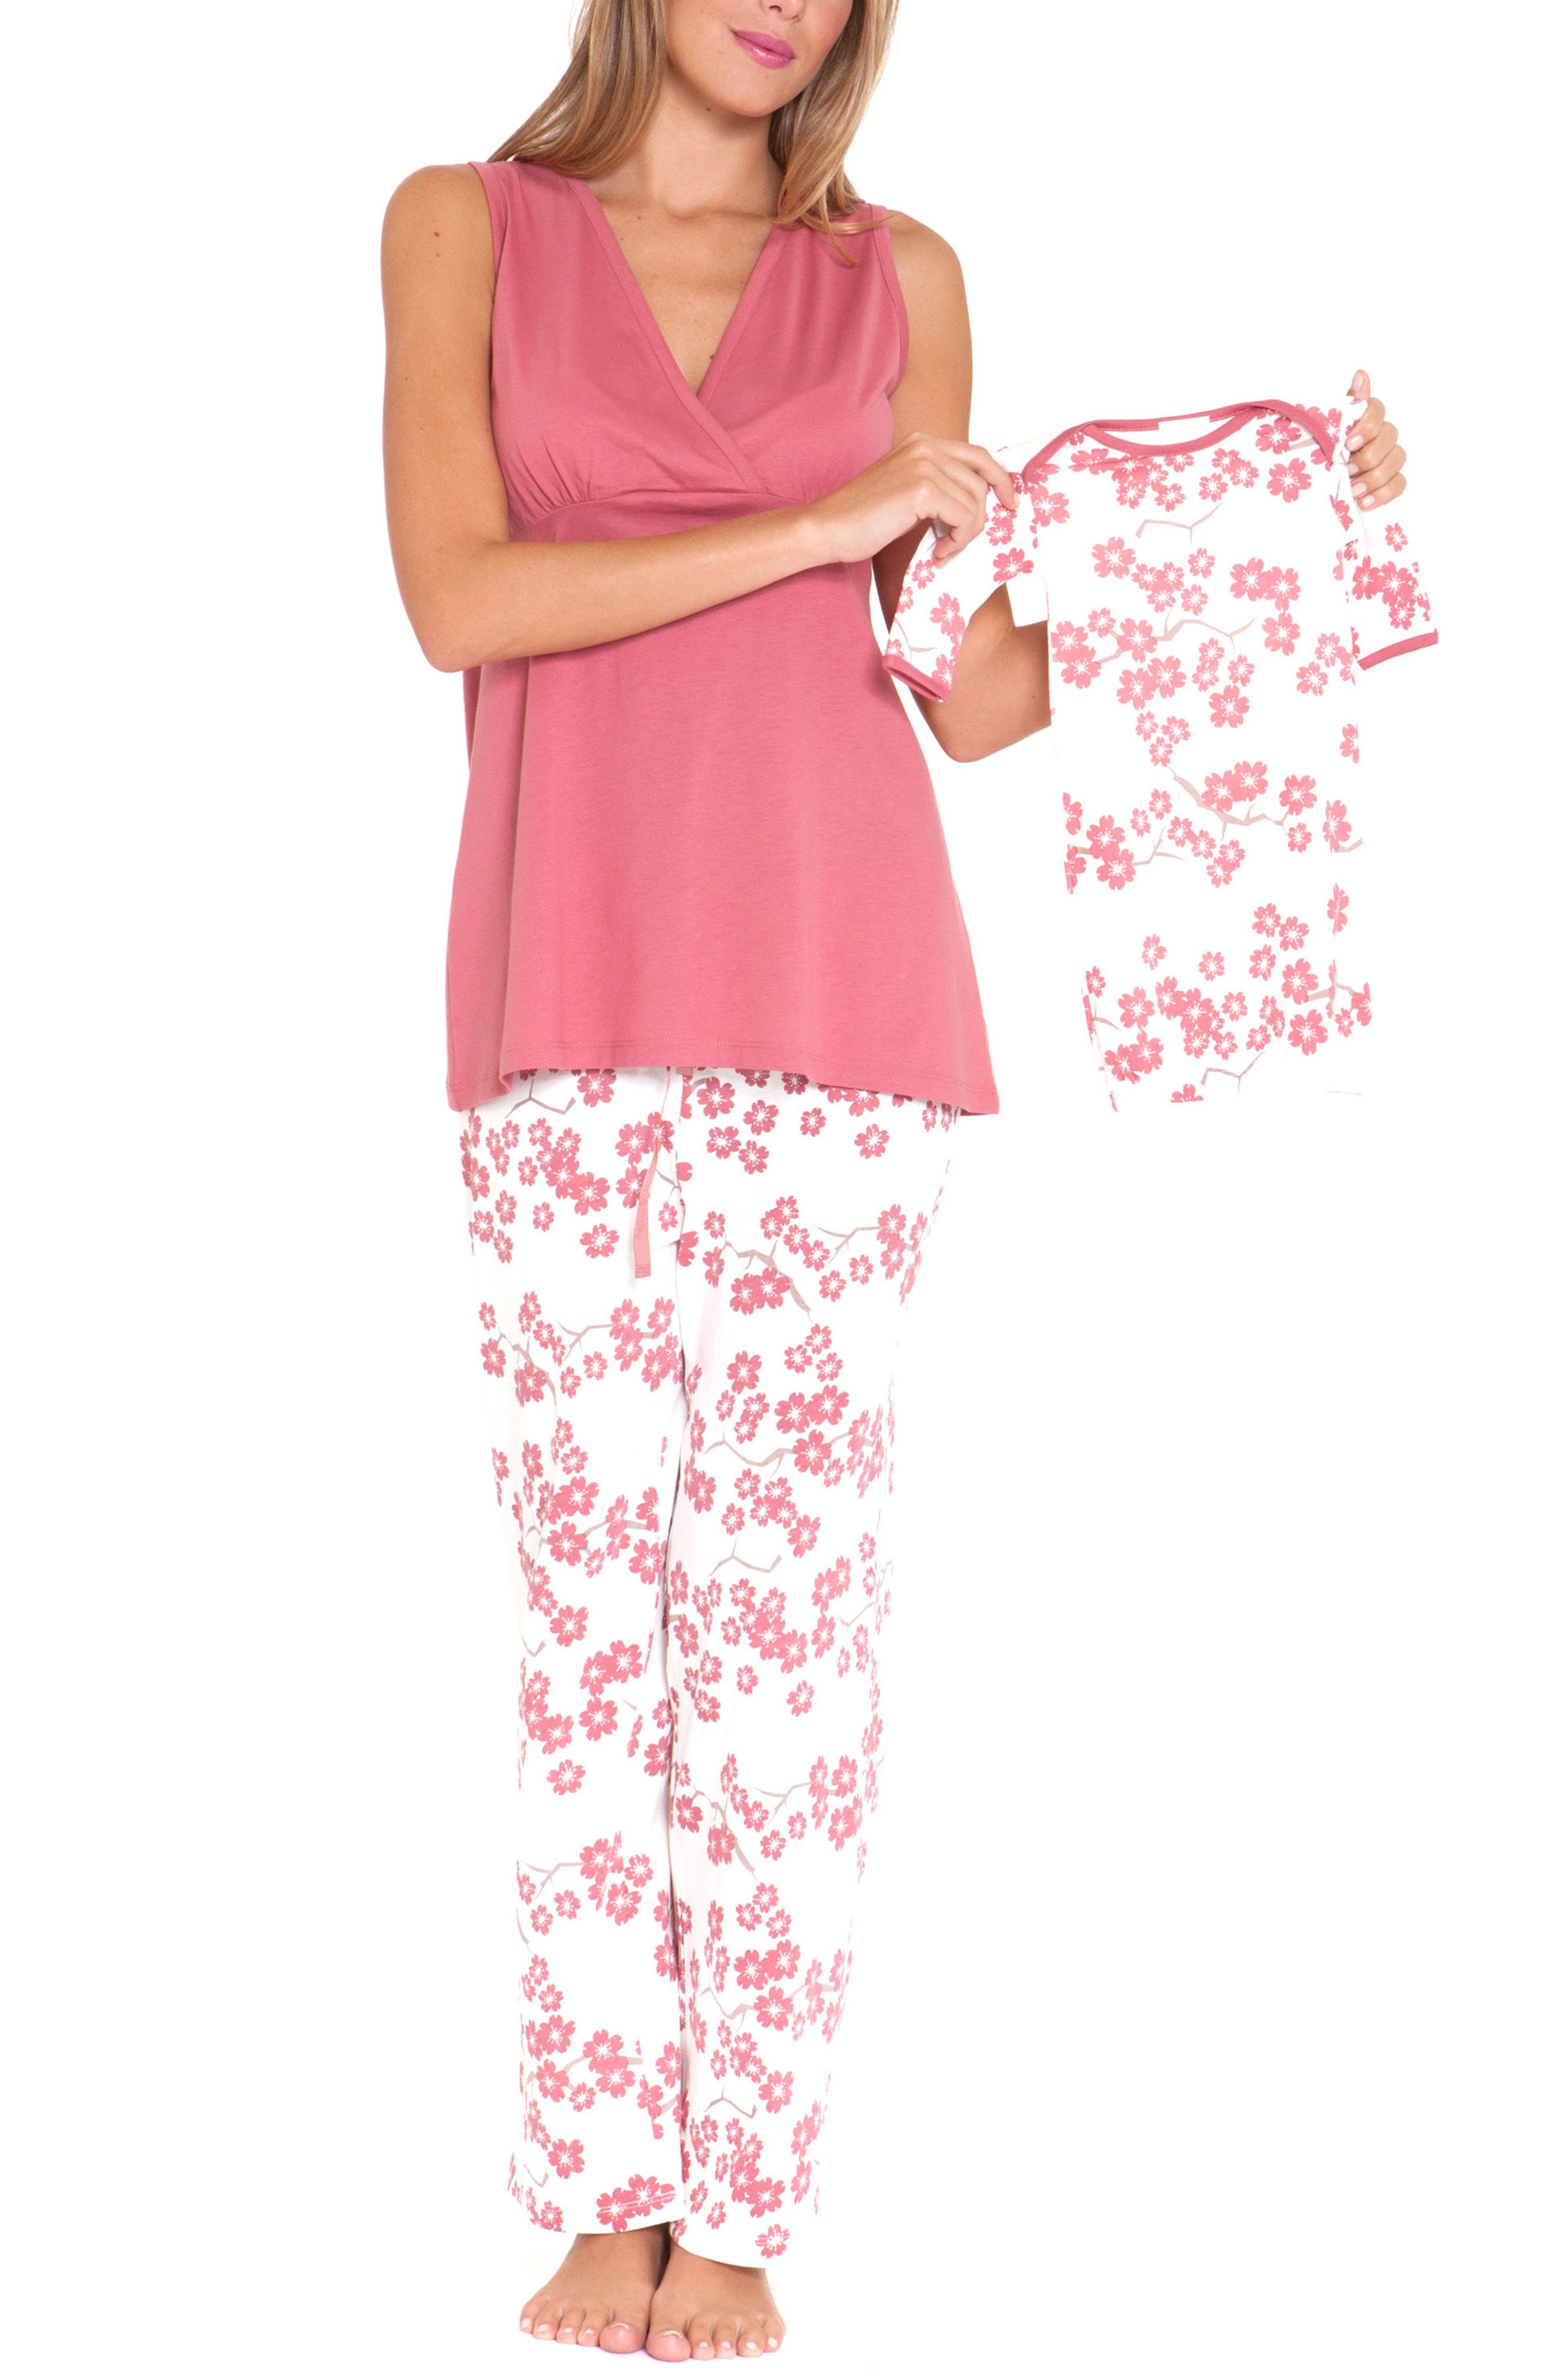 Main Image - Olian 4-Piece Maternity Sleepwear Gift Set